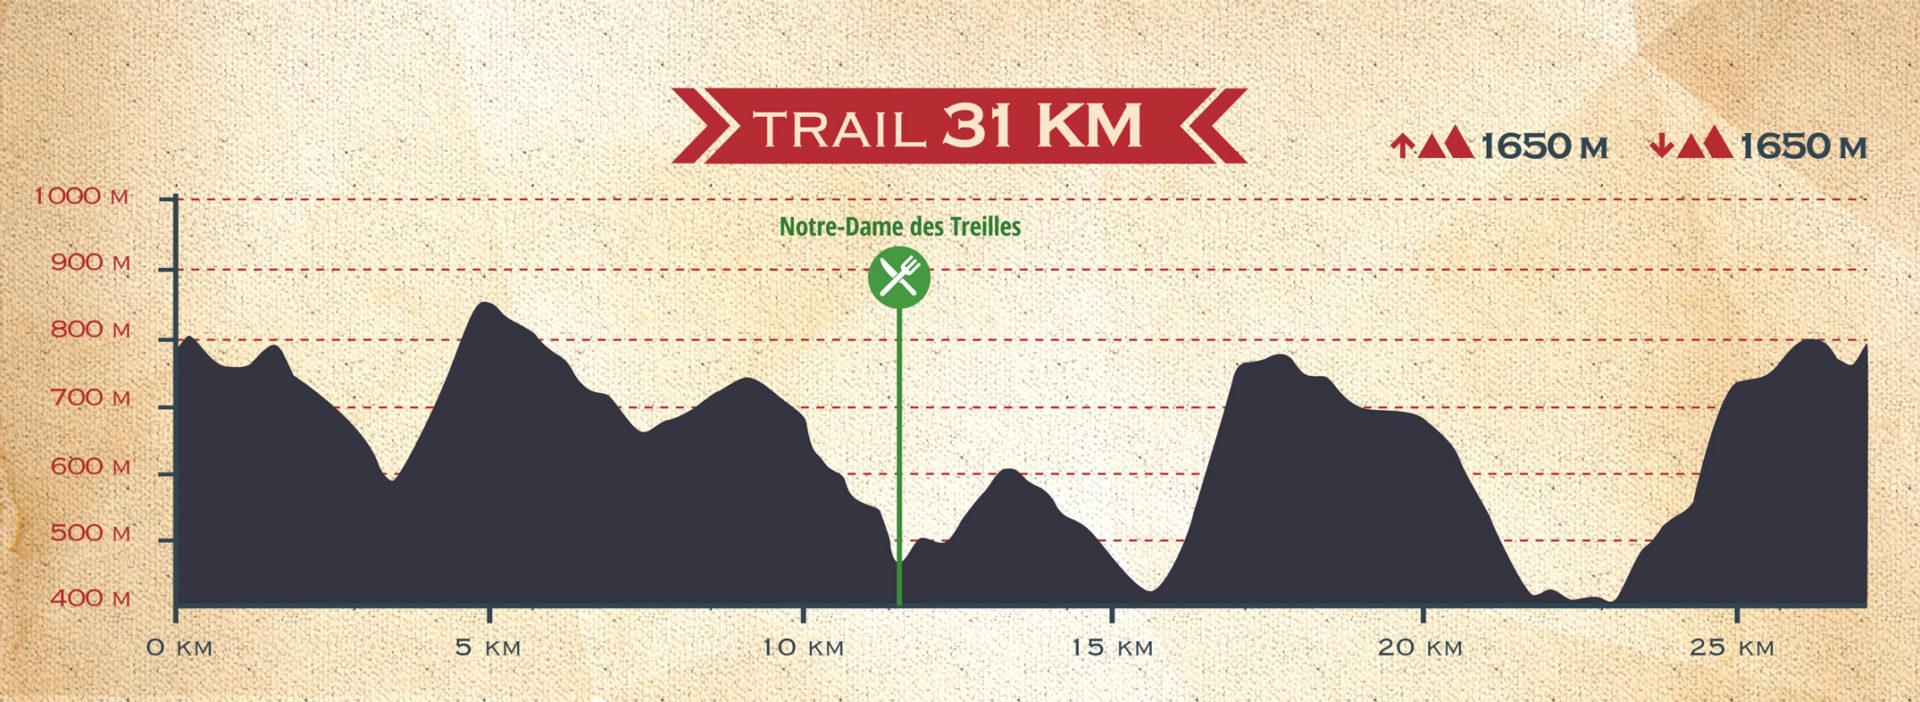 profil-31kms